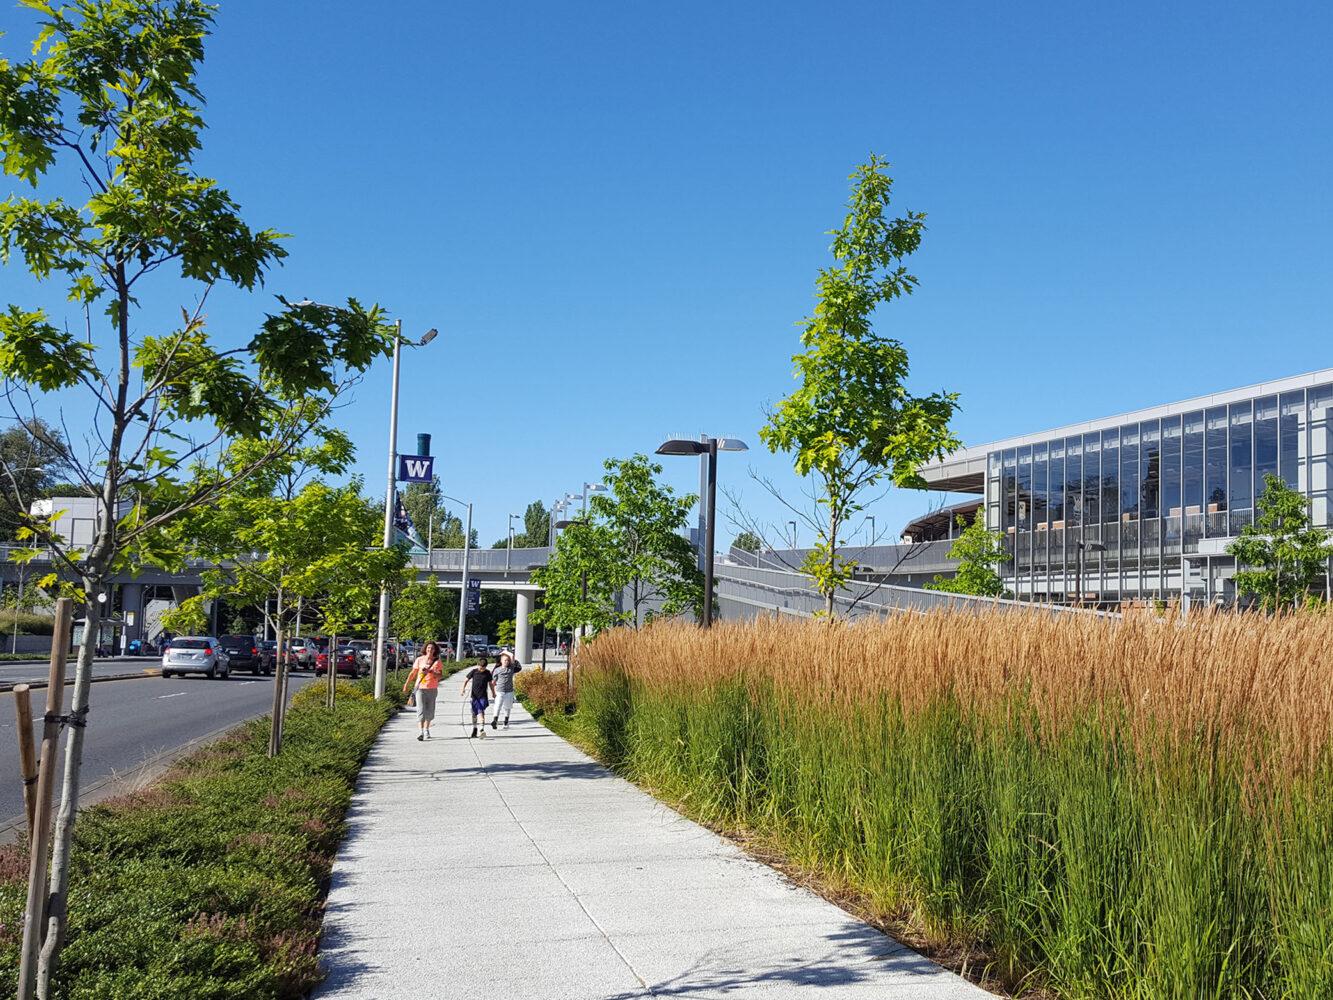 Sound Transit University of Washington Station